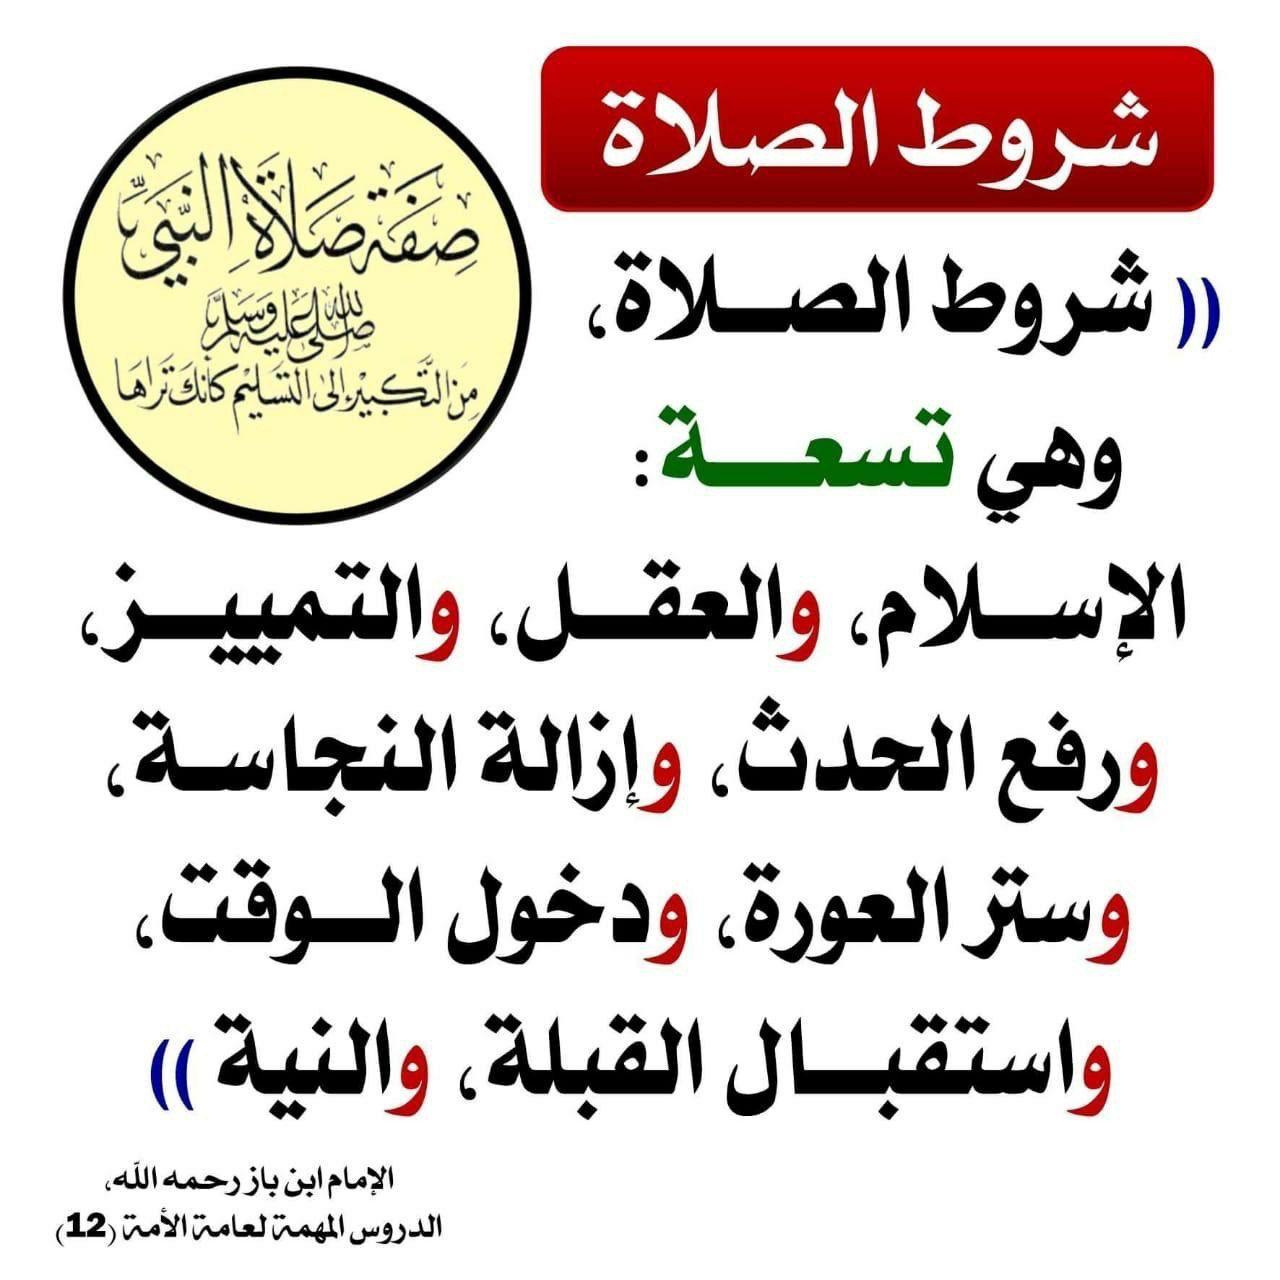 Pin By الأثر الجميل On معلومات دينية Islamic Phrases Islamic Quotes Words